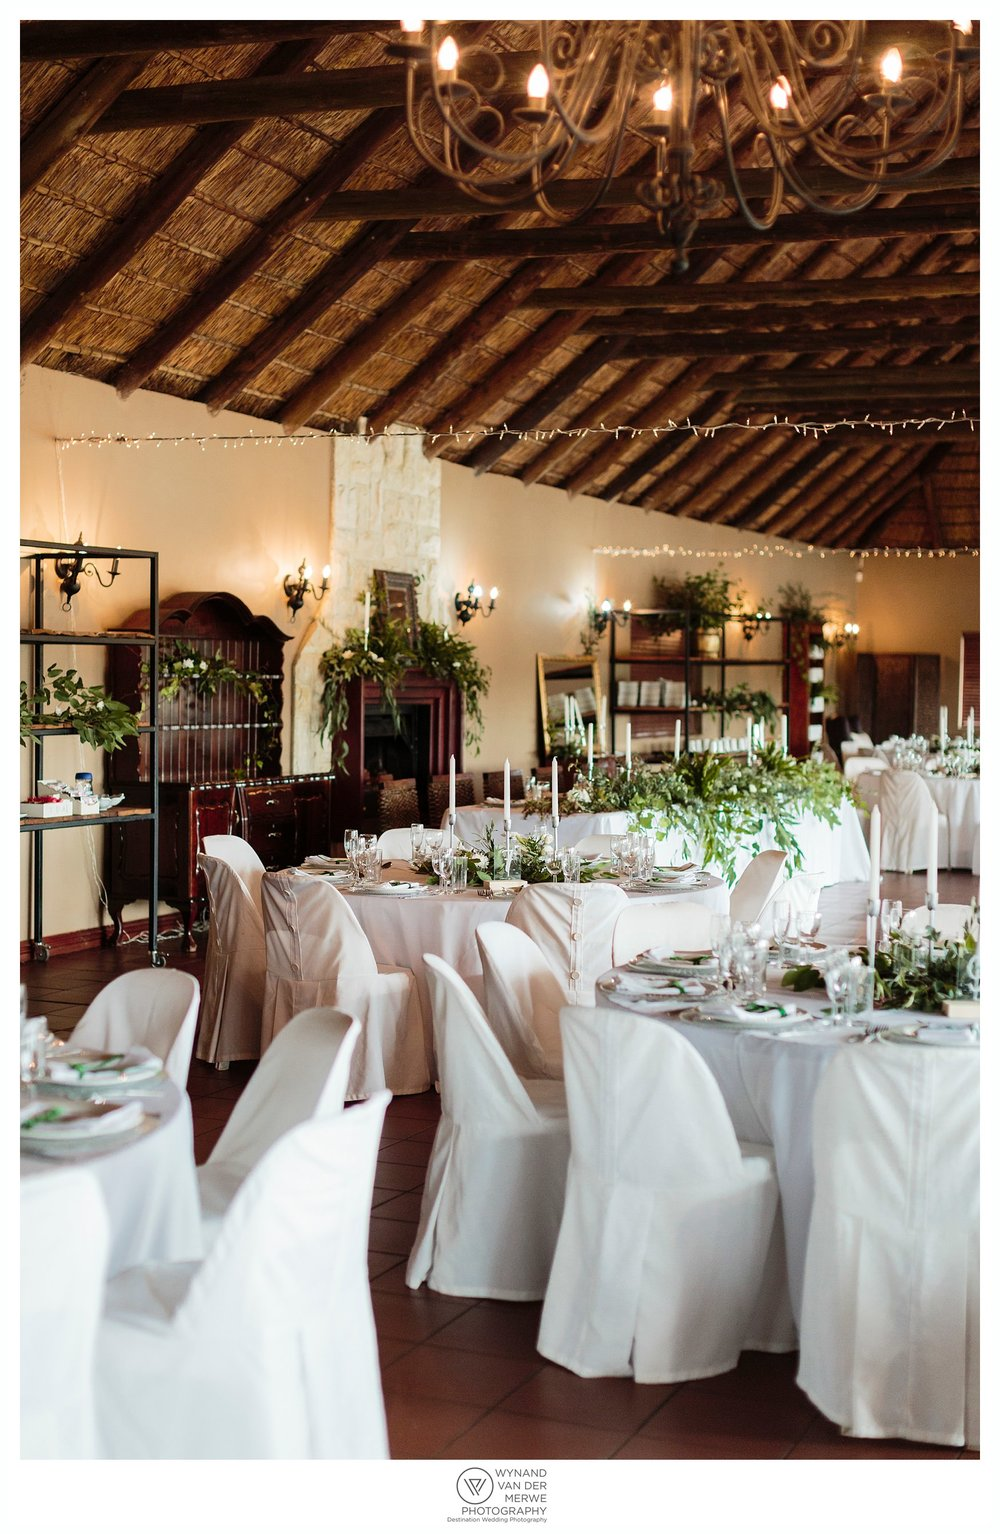 WynandvanderMerwe klaasjan mareli ingaadi spa events beautiful wedding photography gauteng southafrica-52.jpg